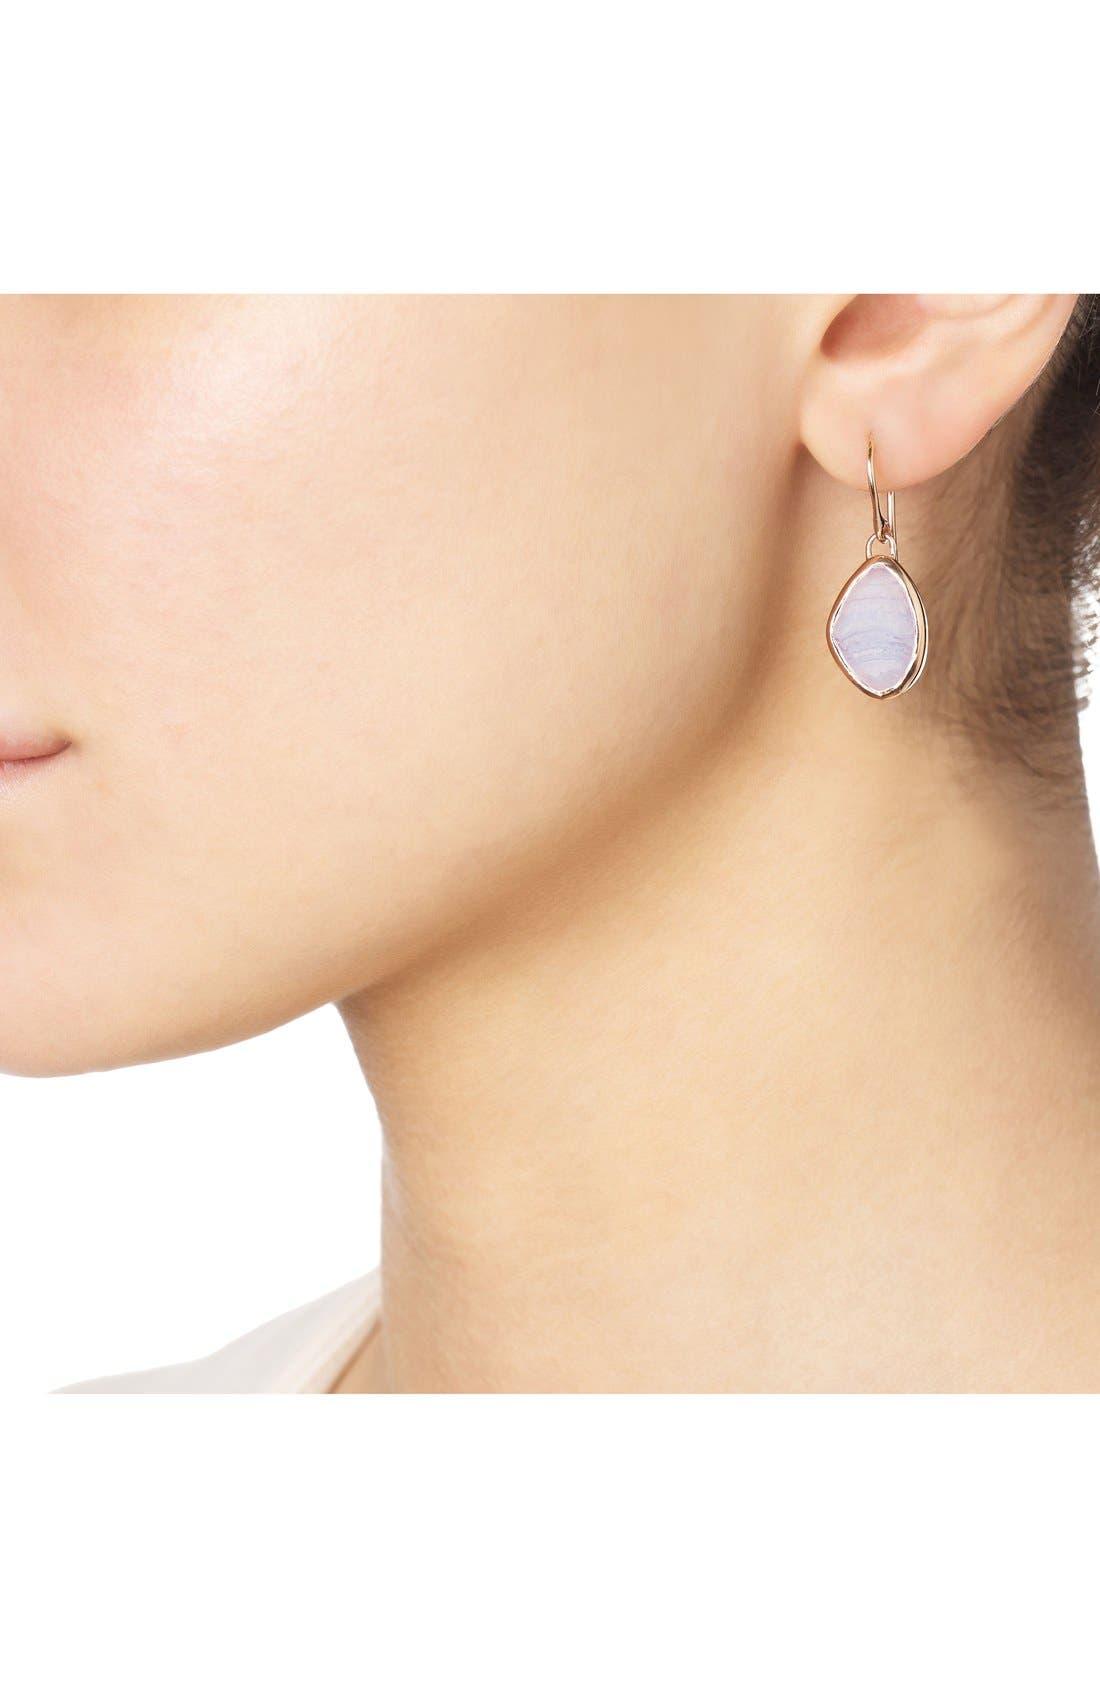 'Siren' Teardrop Earrings,                             Alternate thumbnail 2, color,                             BLUE LACE AGATE/ ROSE GOLD